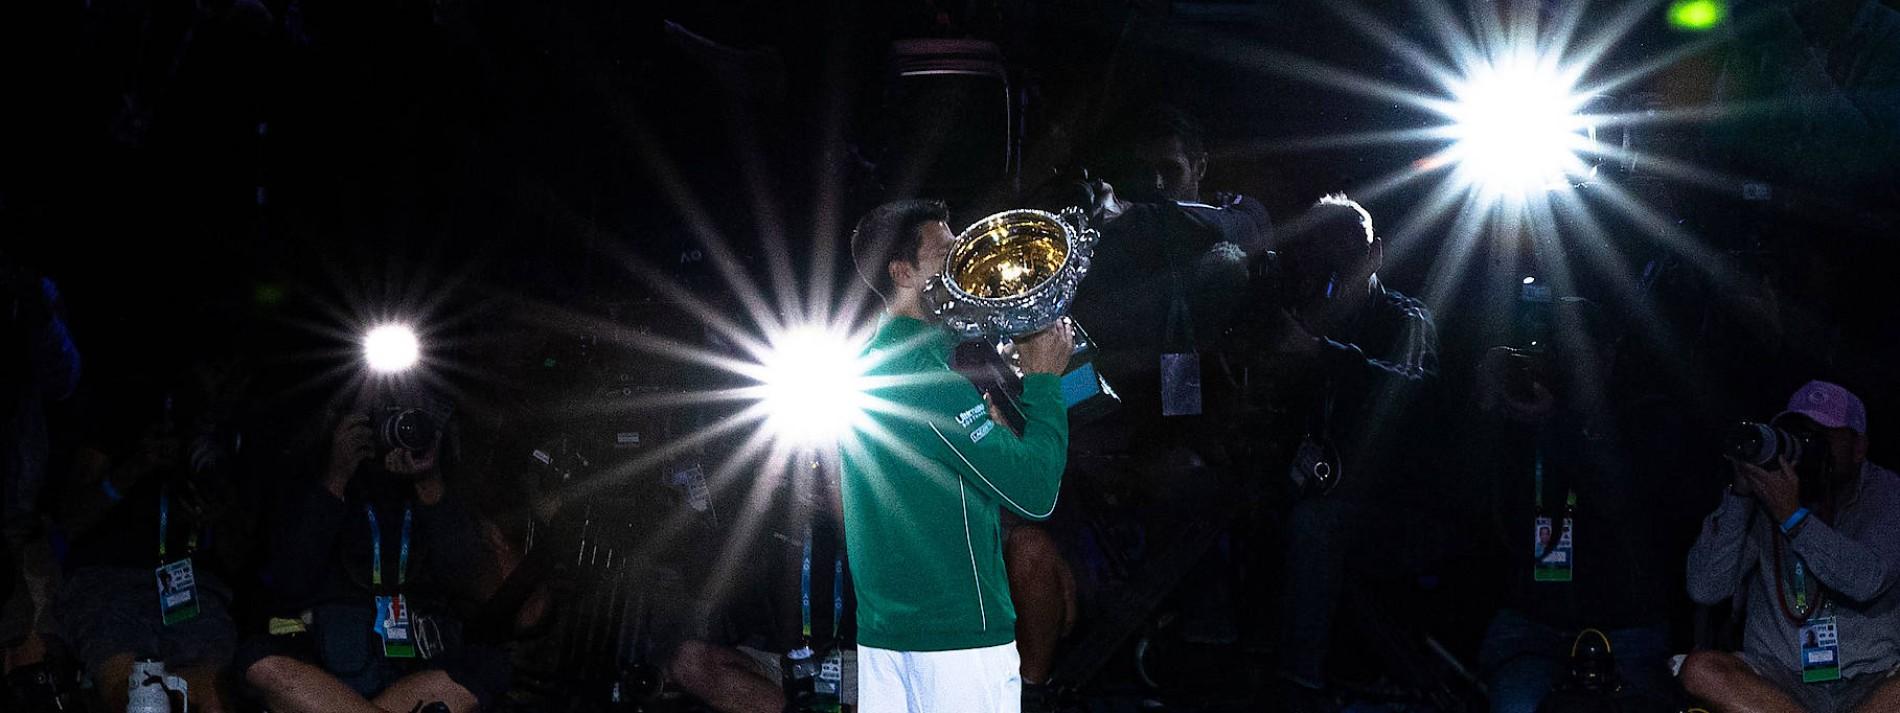 Djokovics mächtige Ansage